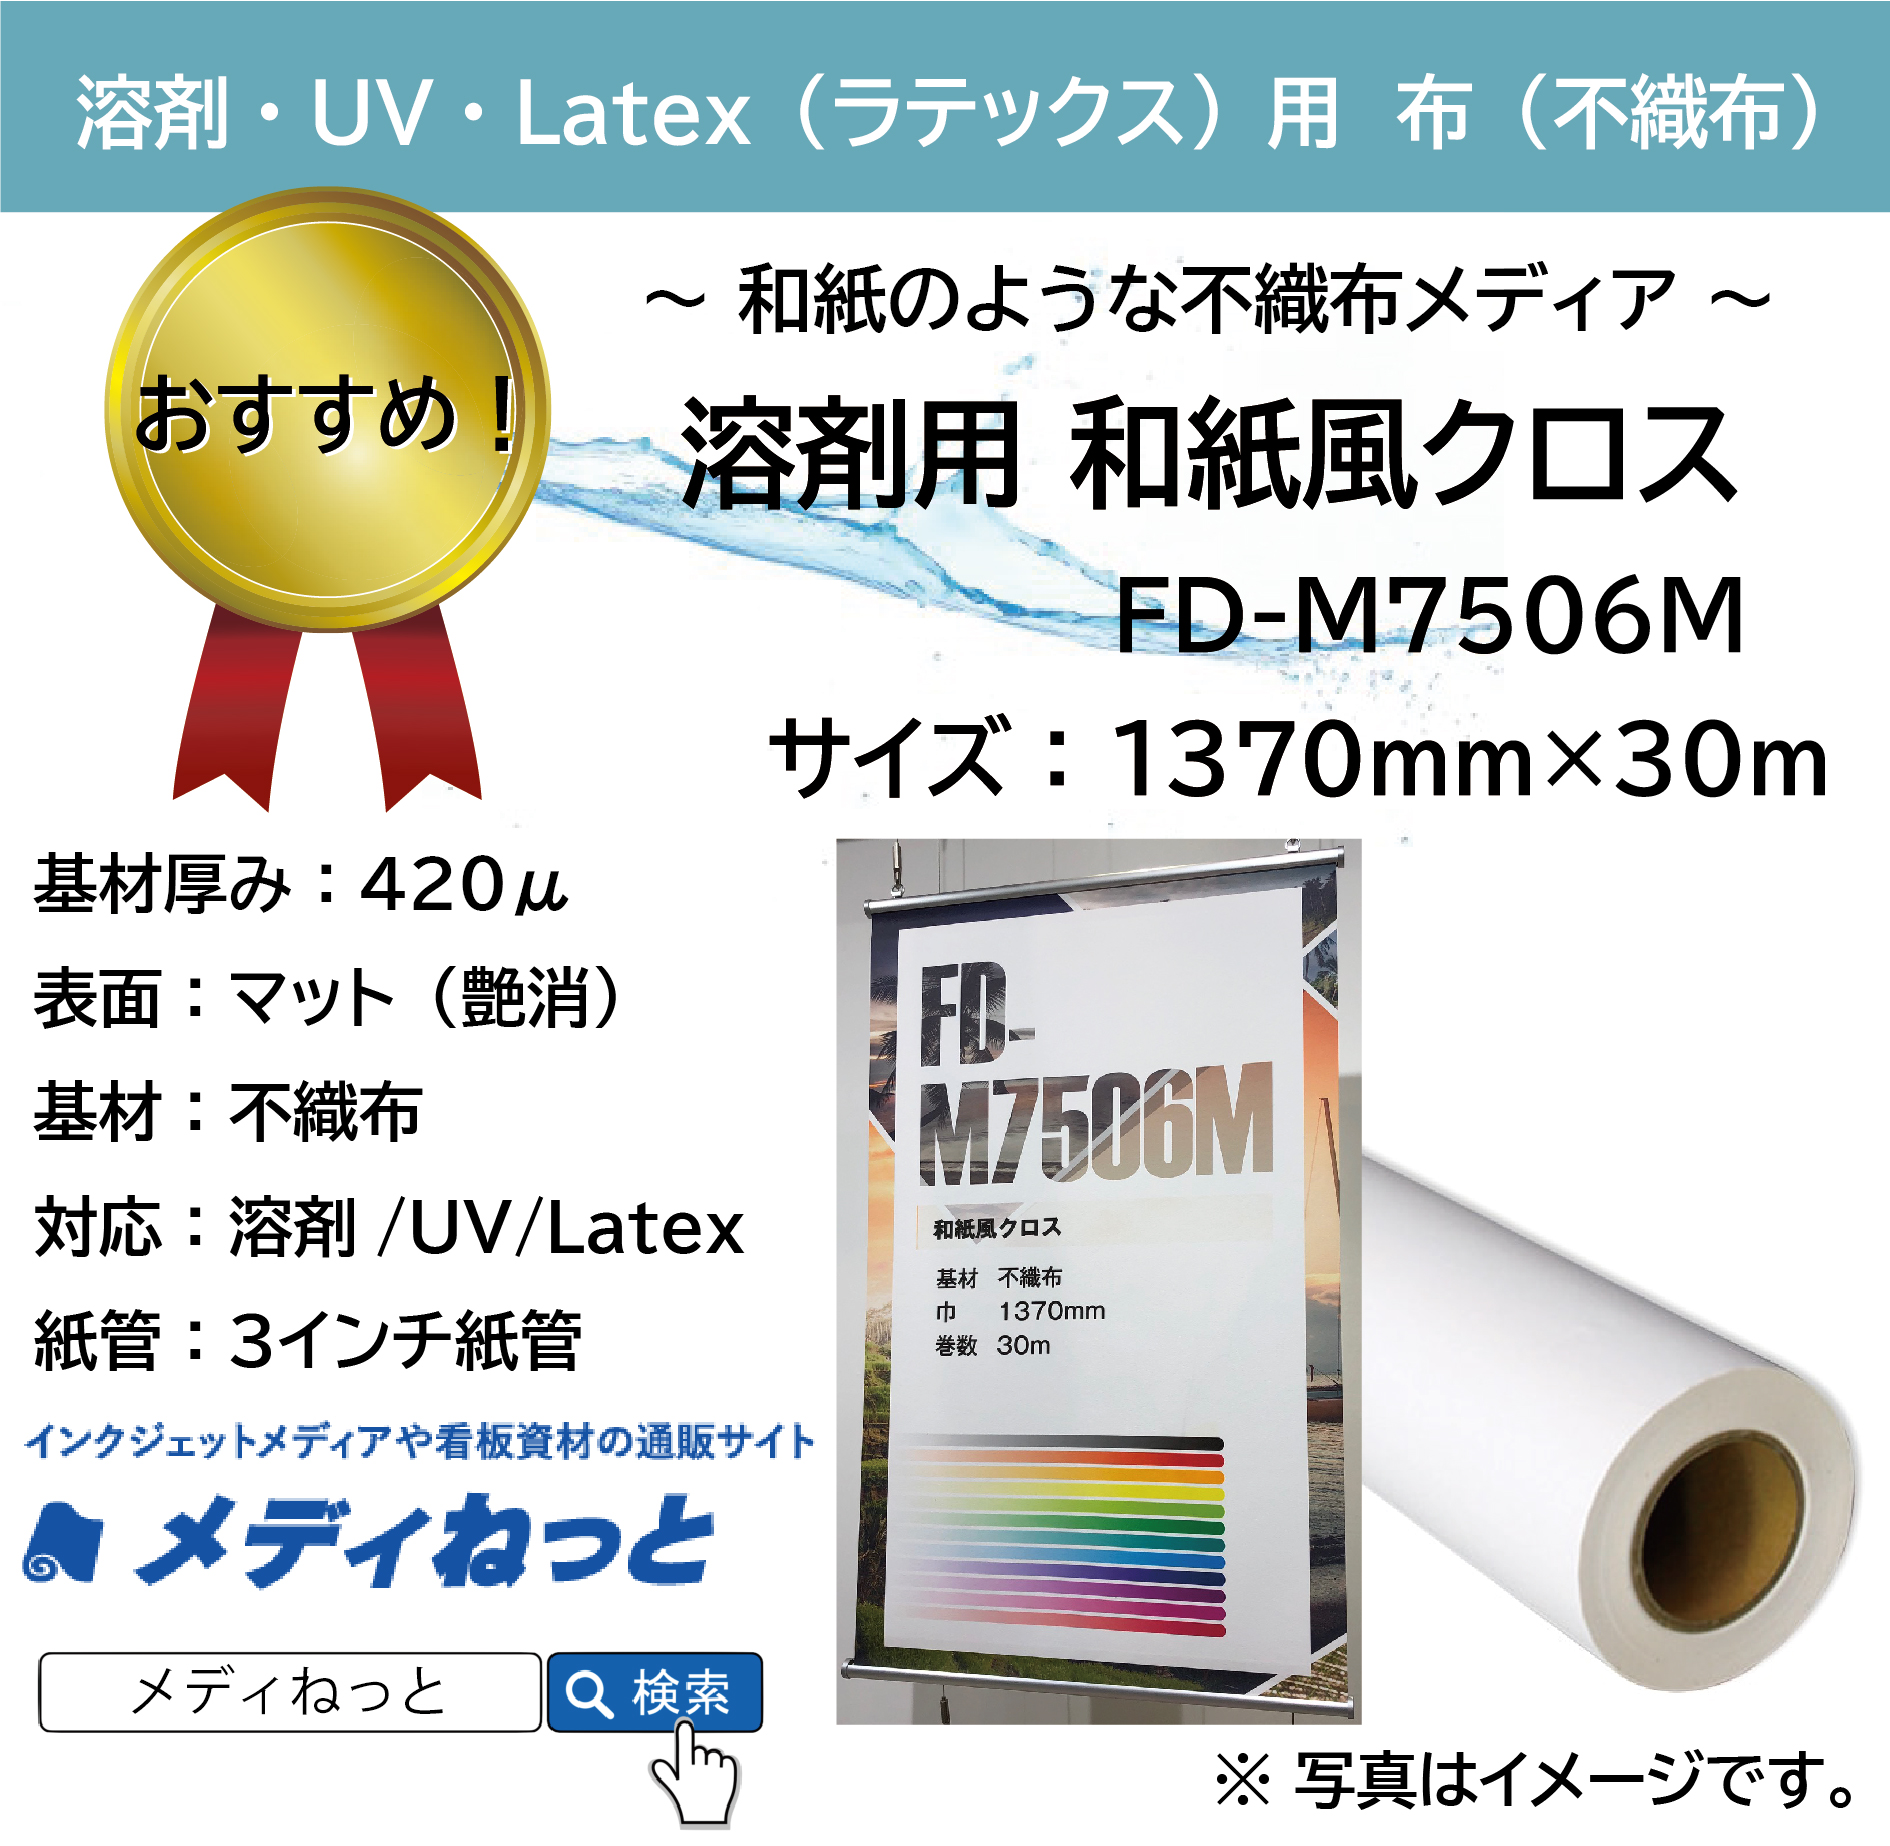 【溶剤、UV、Latex対応】溶剤用 和紙風クロス(不織布/FD-M7506M) 1370mm×30m